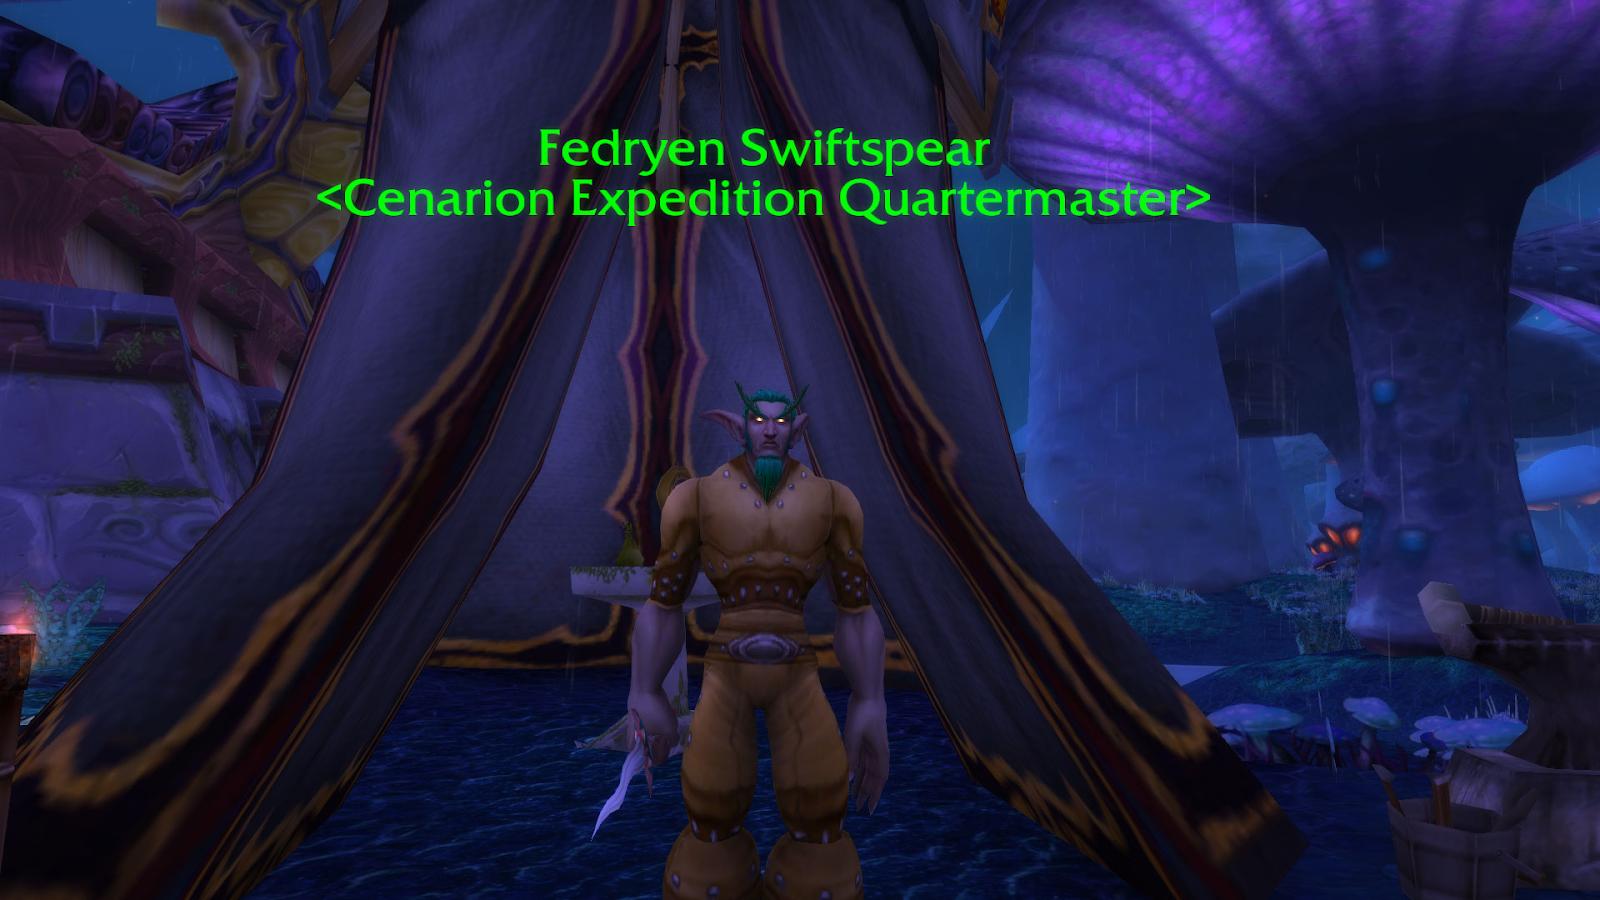 Fedryen Swiftspear who sells the Cenarion War Hippogryph